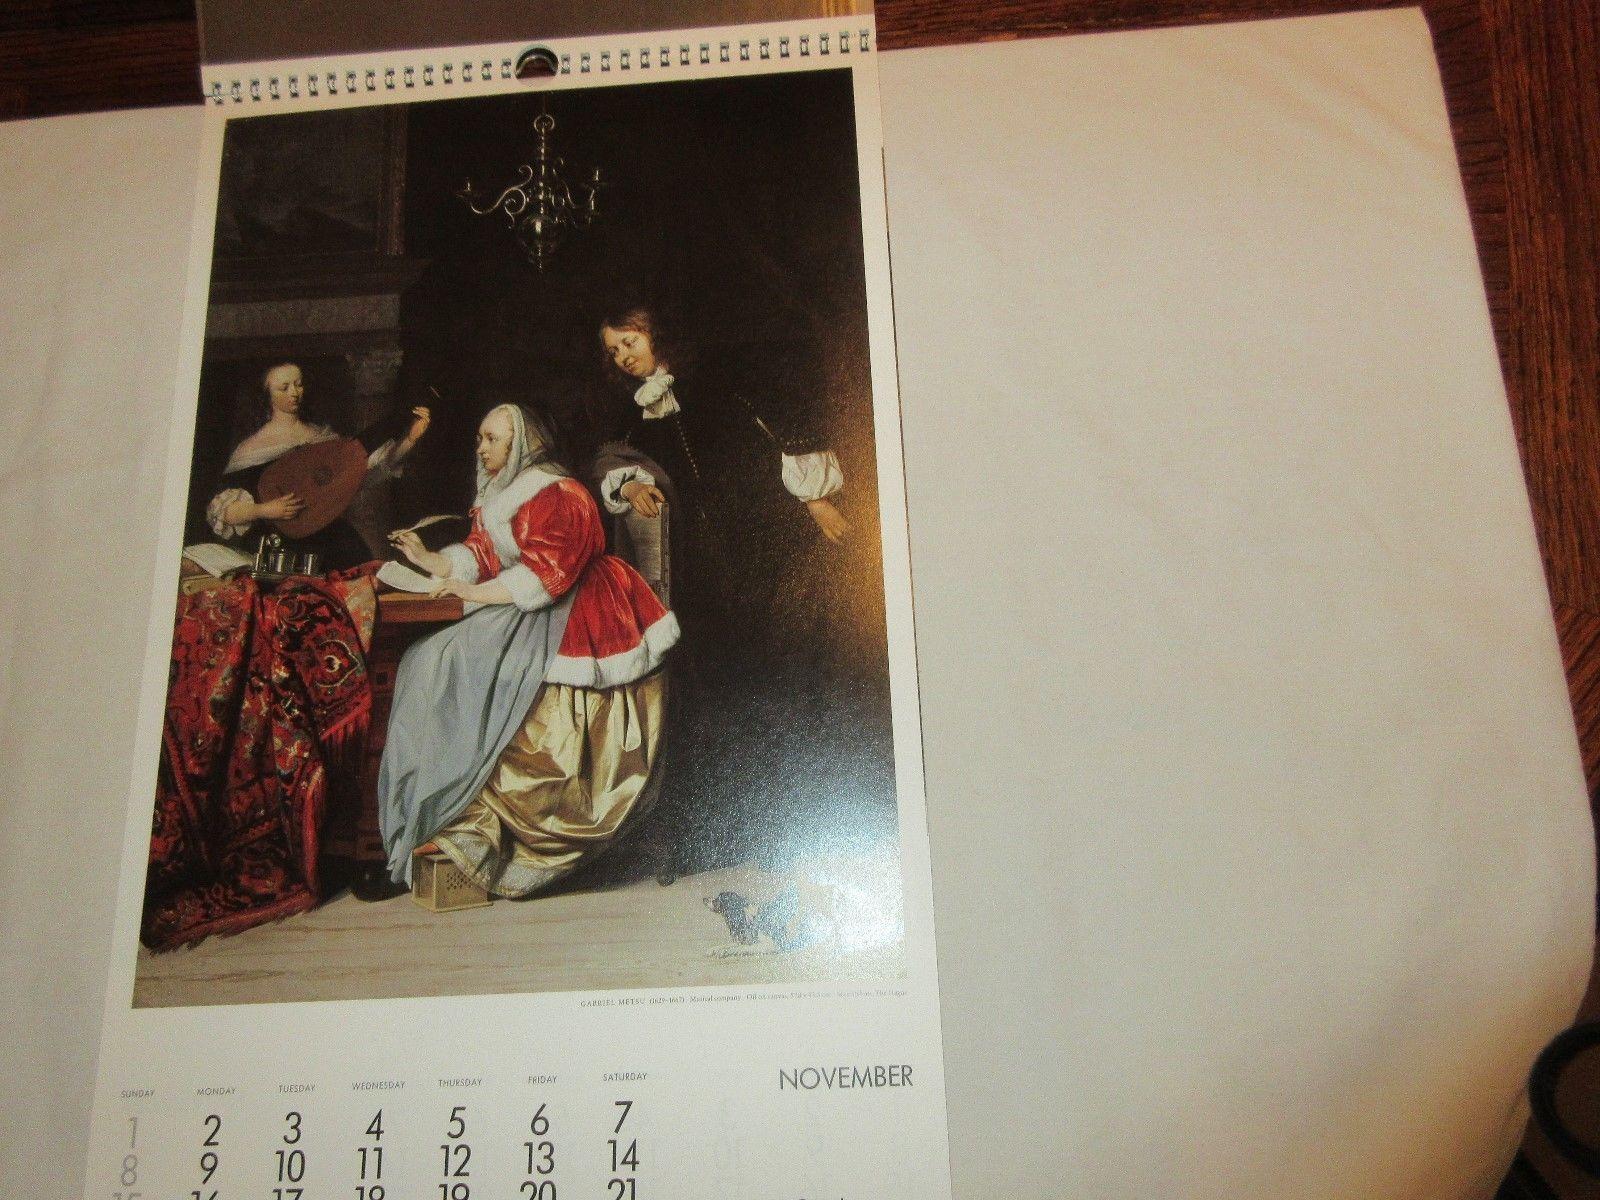 Rx , Pharmacy , Calendar , Hoechst-Roussel Pharmaceuticals Inc.,1987 , Vintage image 9